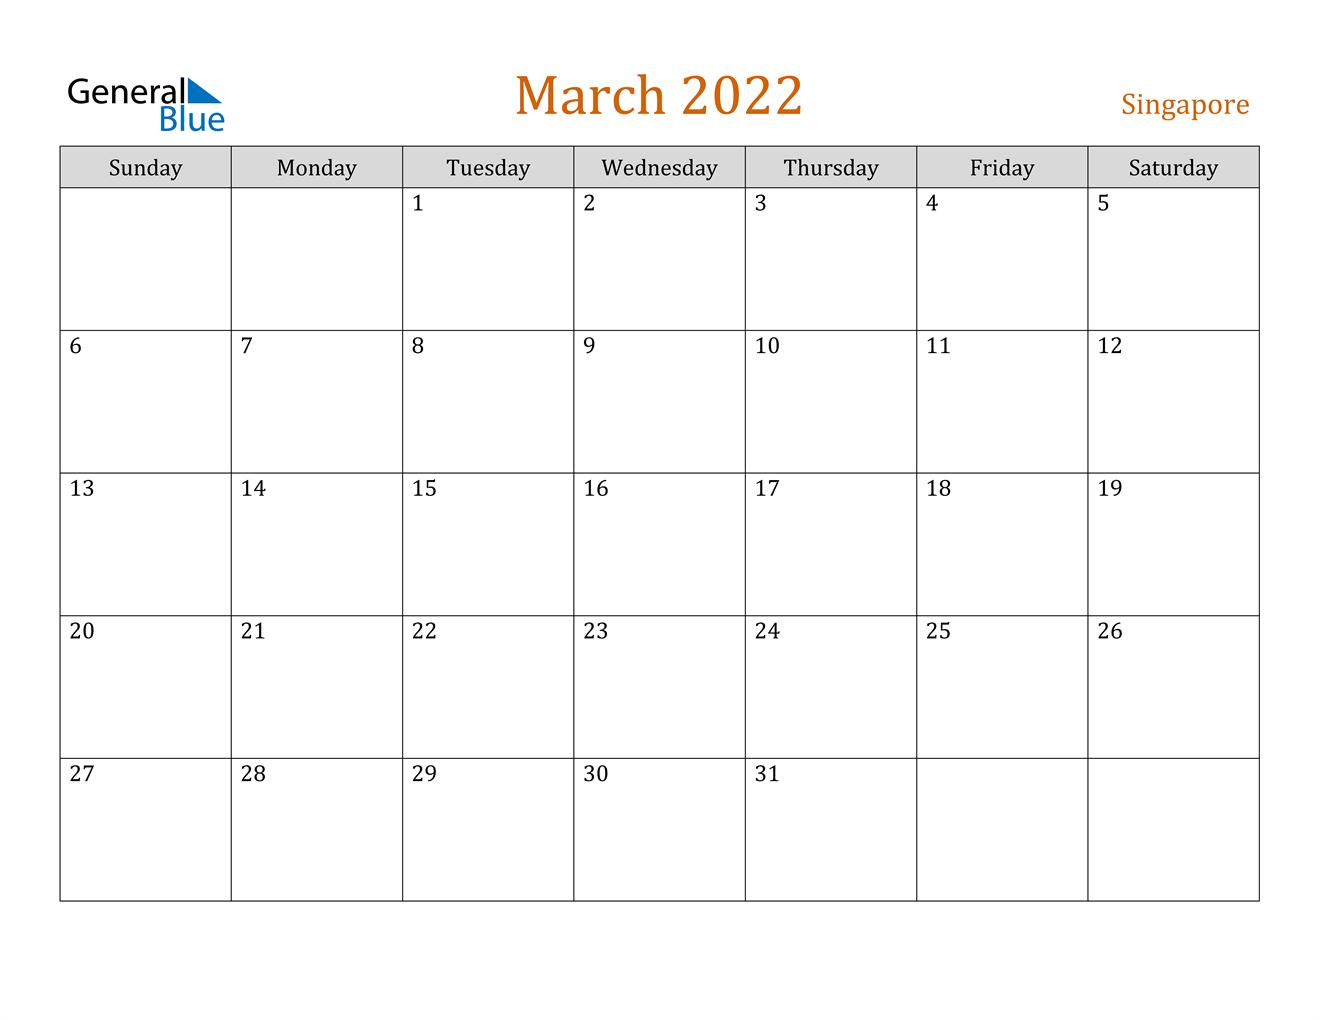 March 2022 Calendar - Singapore